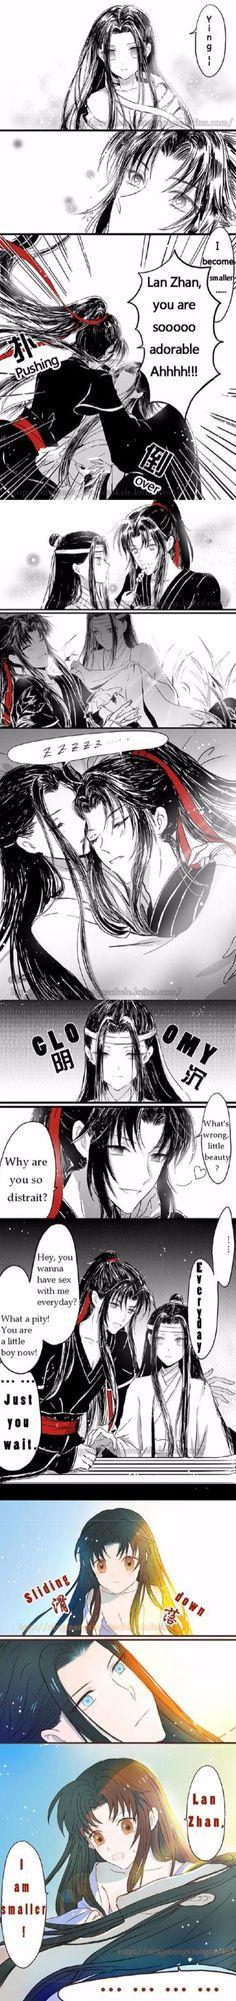 Mosspaca Advertising Department, Manga Cute, The Grandmaster, Shounen Ai, Kuroko, Chinese Art, Haha Funny, Manhwa, Novels